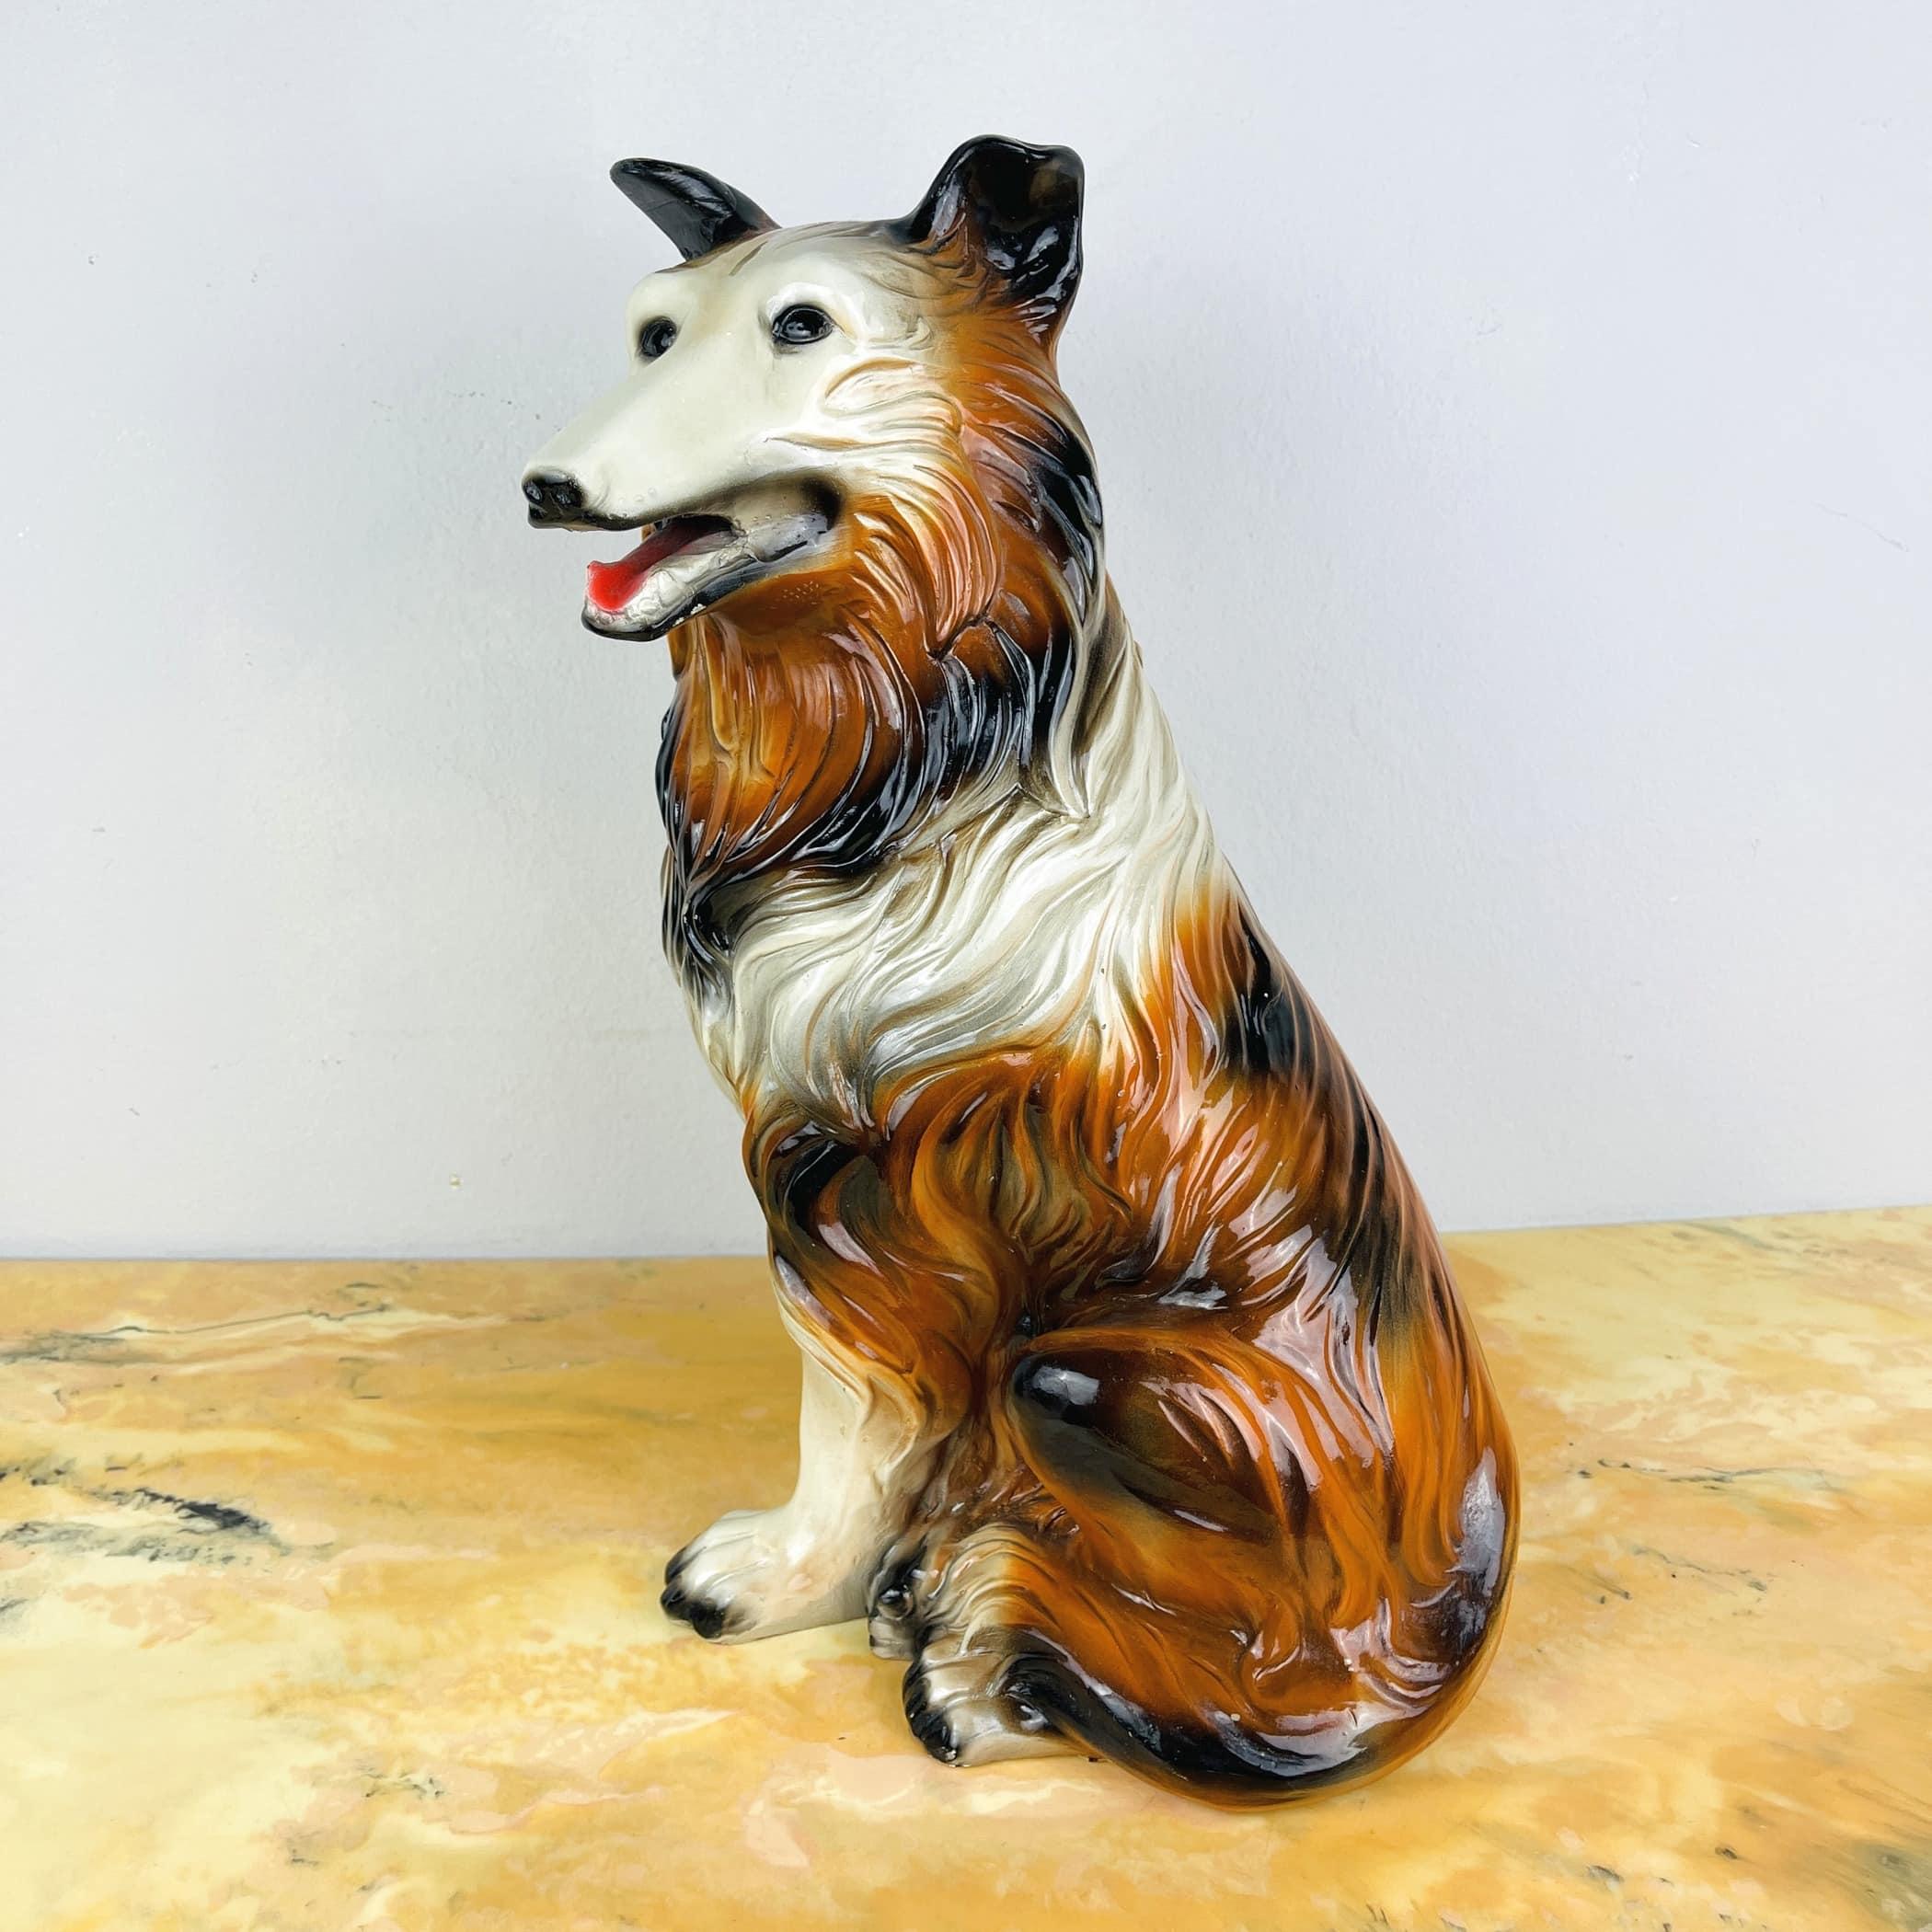 Vintage hand-painted sculpture Dog Italy 1960s Retro home decor mid-century italian decoration